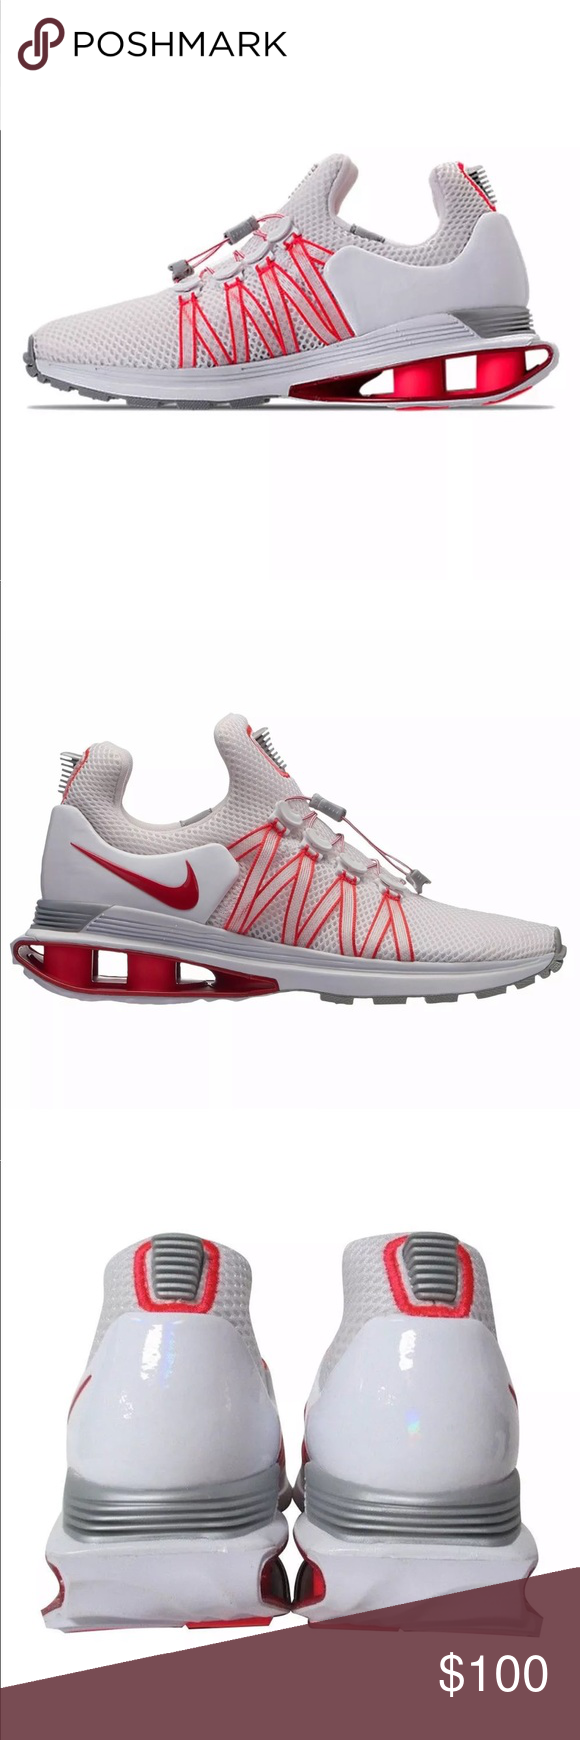 quality design fbd39 c2a65 Nike Shox Gravity White Red Mesh Shoes NEW Nike Shox Gravity White  University Red Mesh Running